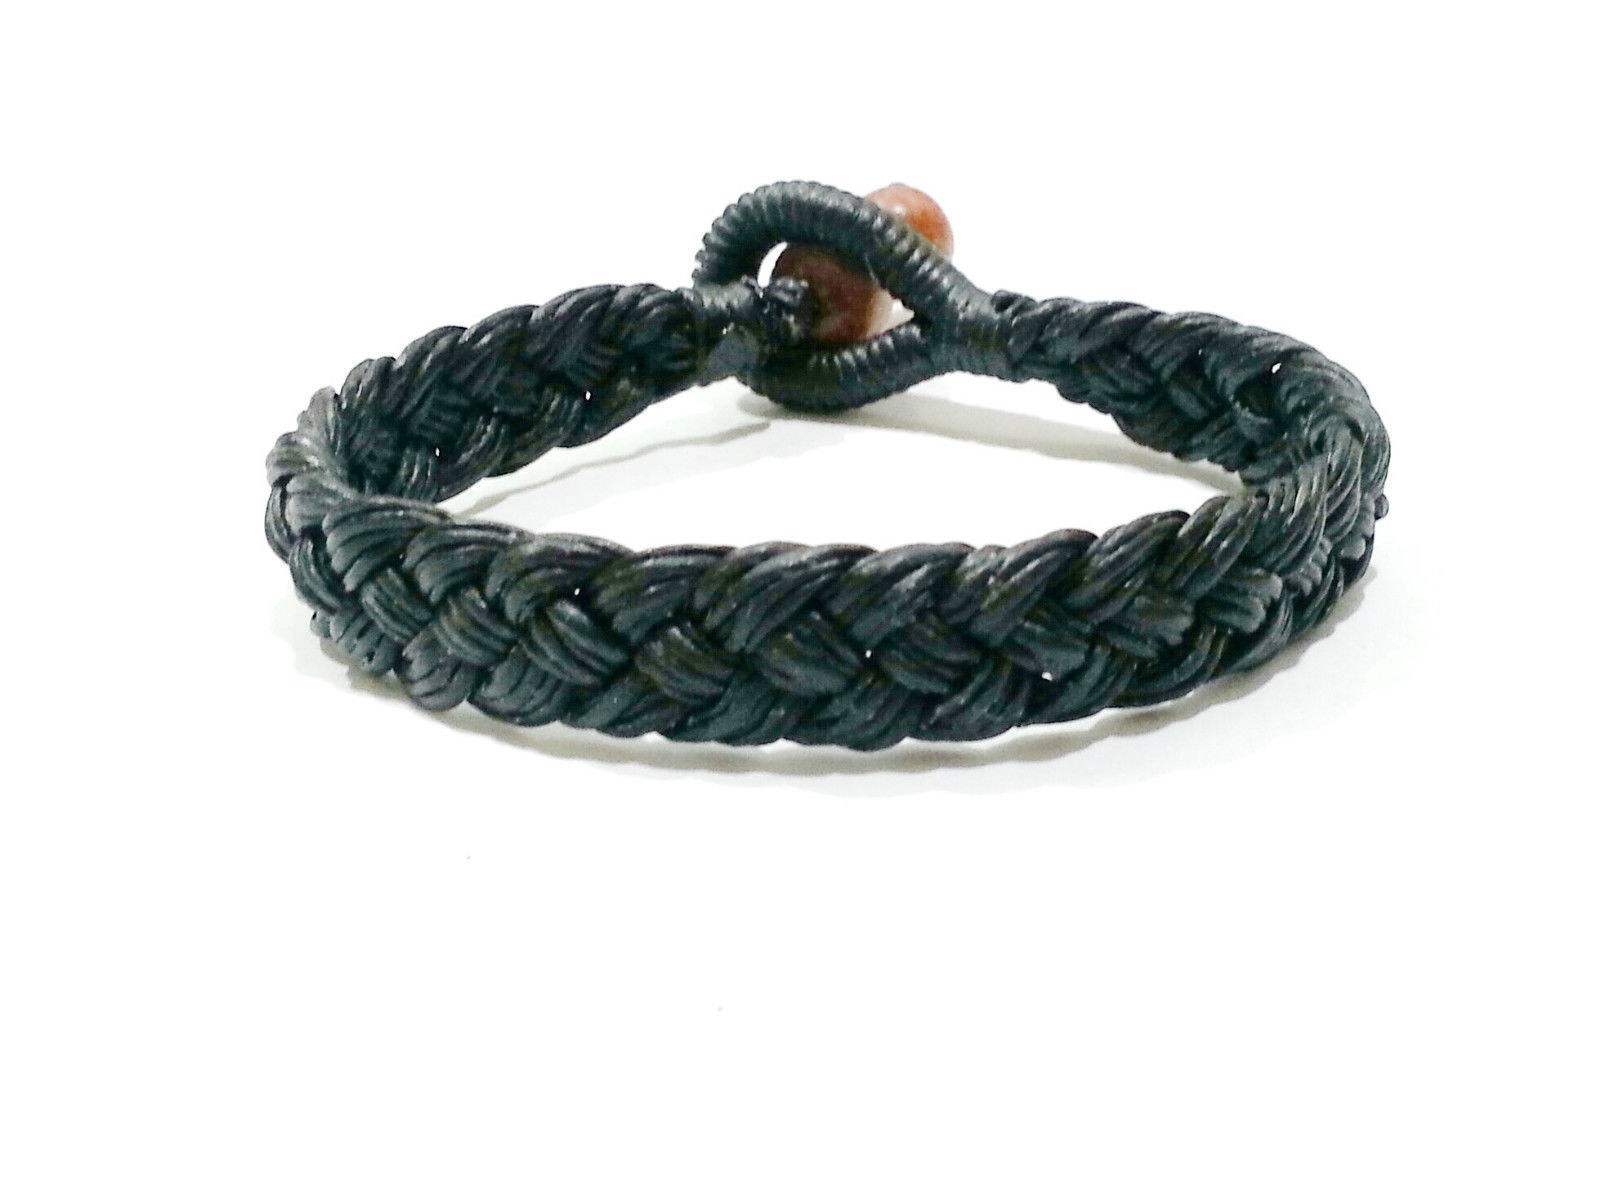 Fair Trade Waxed Cotton Buddhist Thai Wristband Classic Handcrafted Wristwear